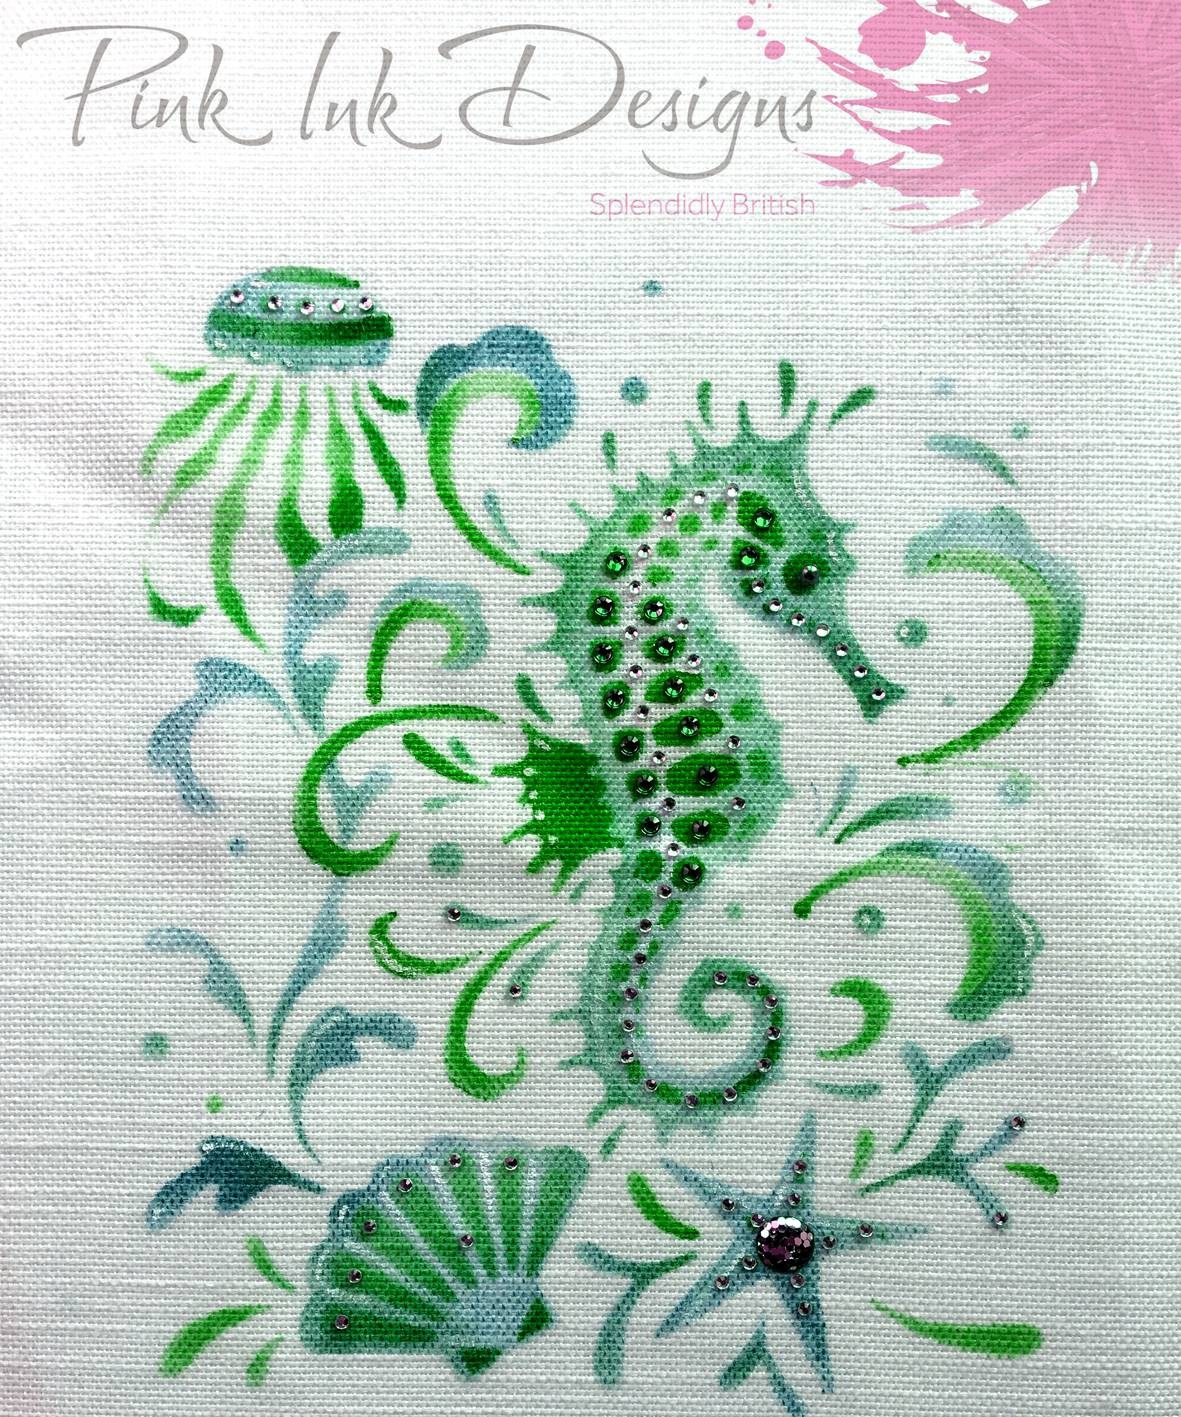 pink ink designs layered stencil seahorse sample